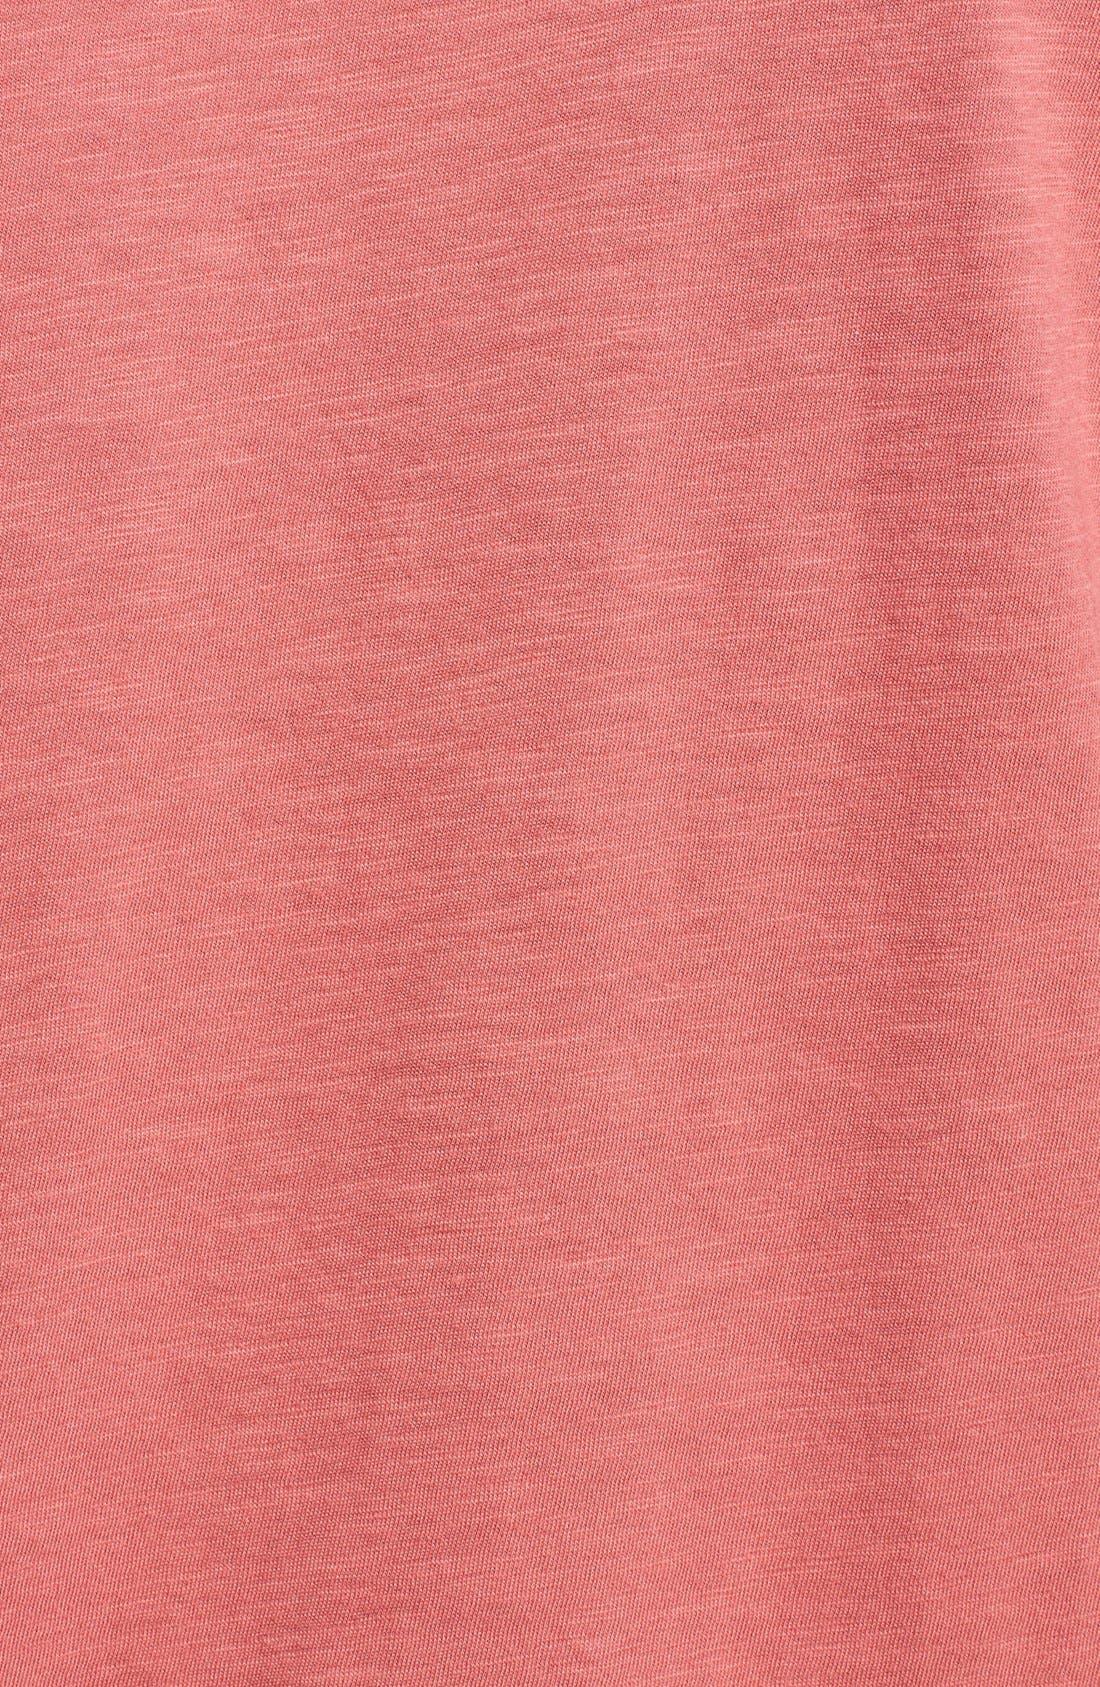 Alternate Image 3  - True Religion Brand Jeans 'Stark' Graphic T-Shirt